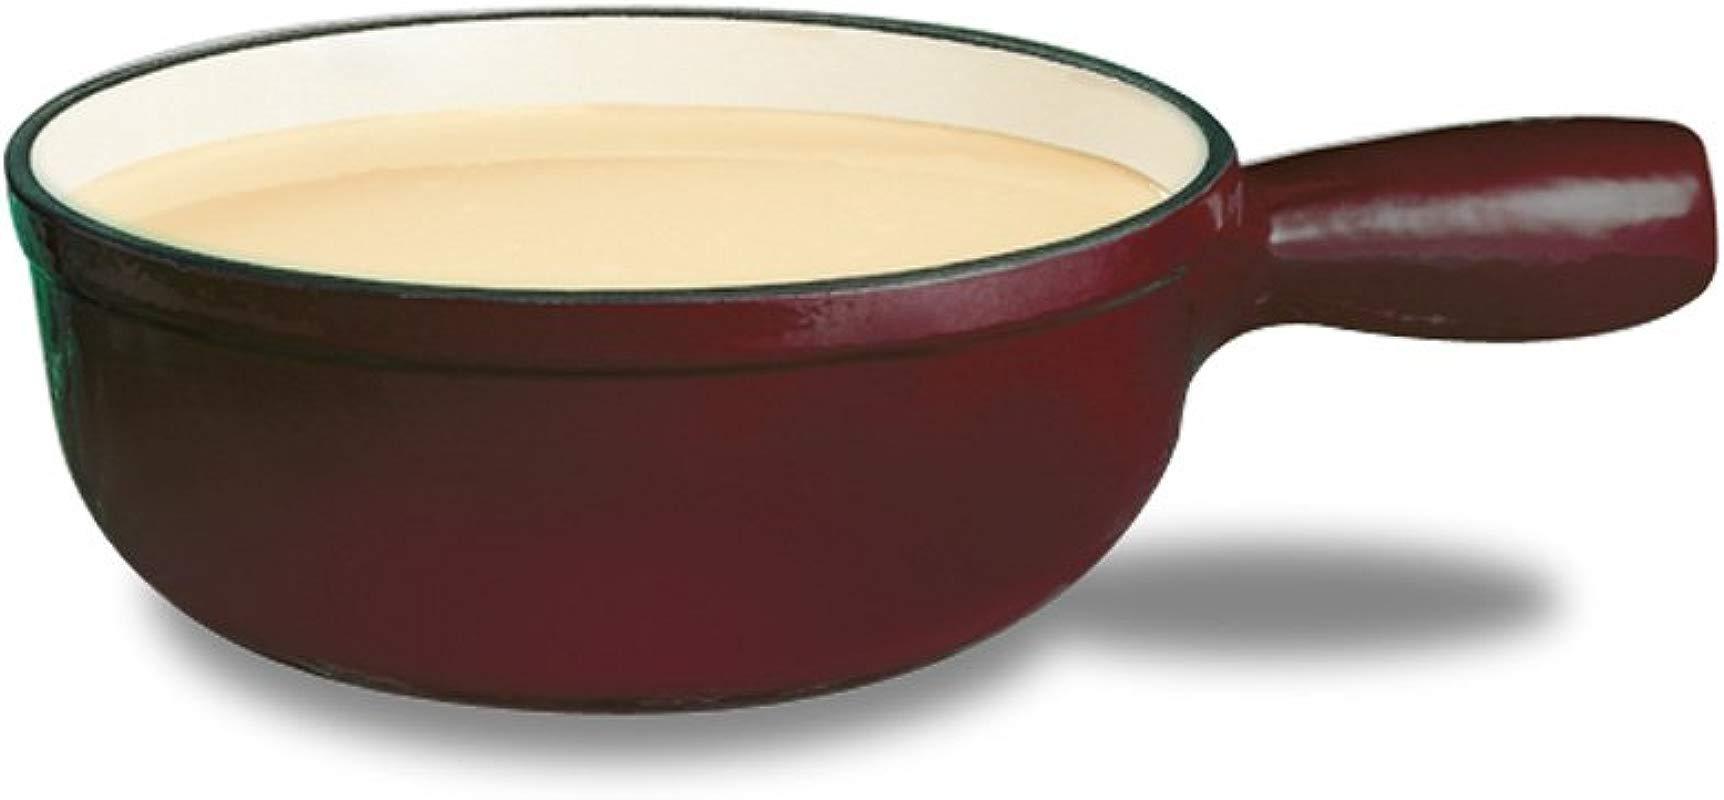 Swissmar F65004 Lugano 1 1 2 Quart Cheese Fondue Pot Cherry Red